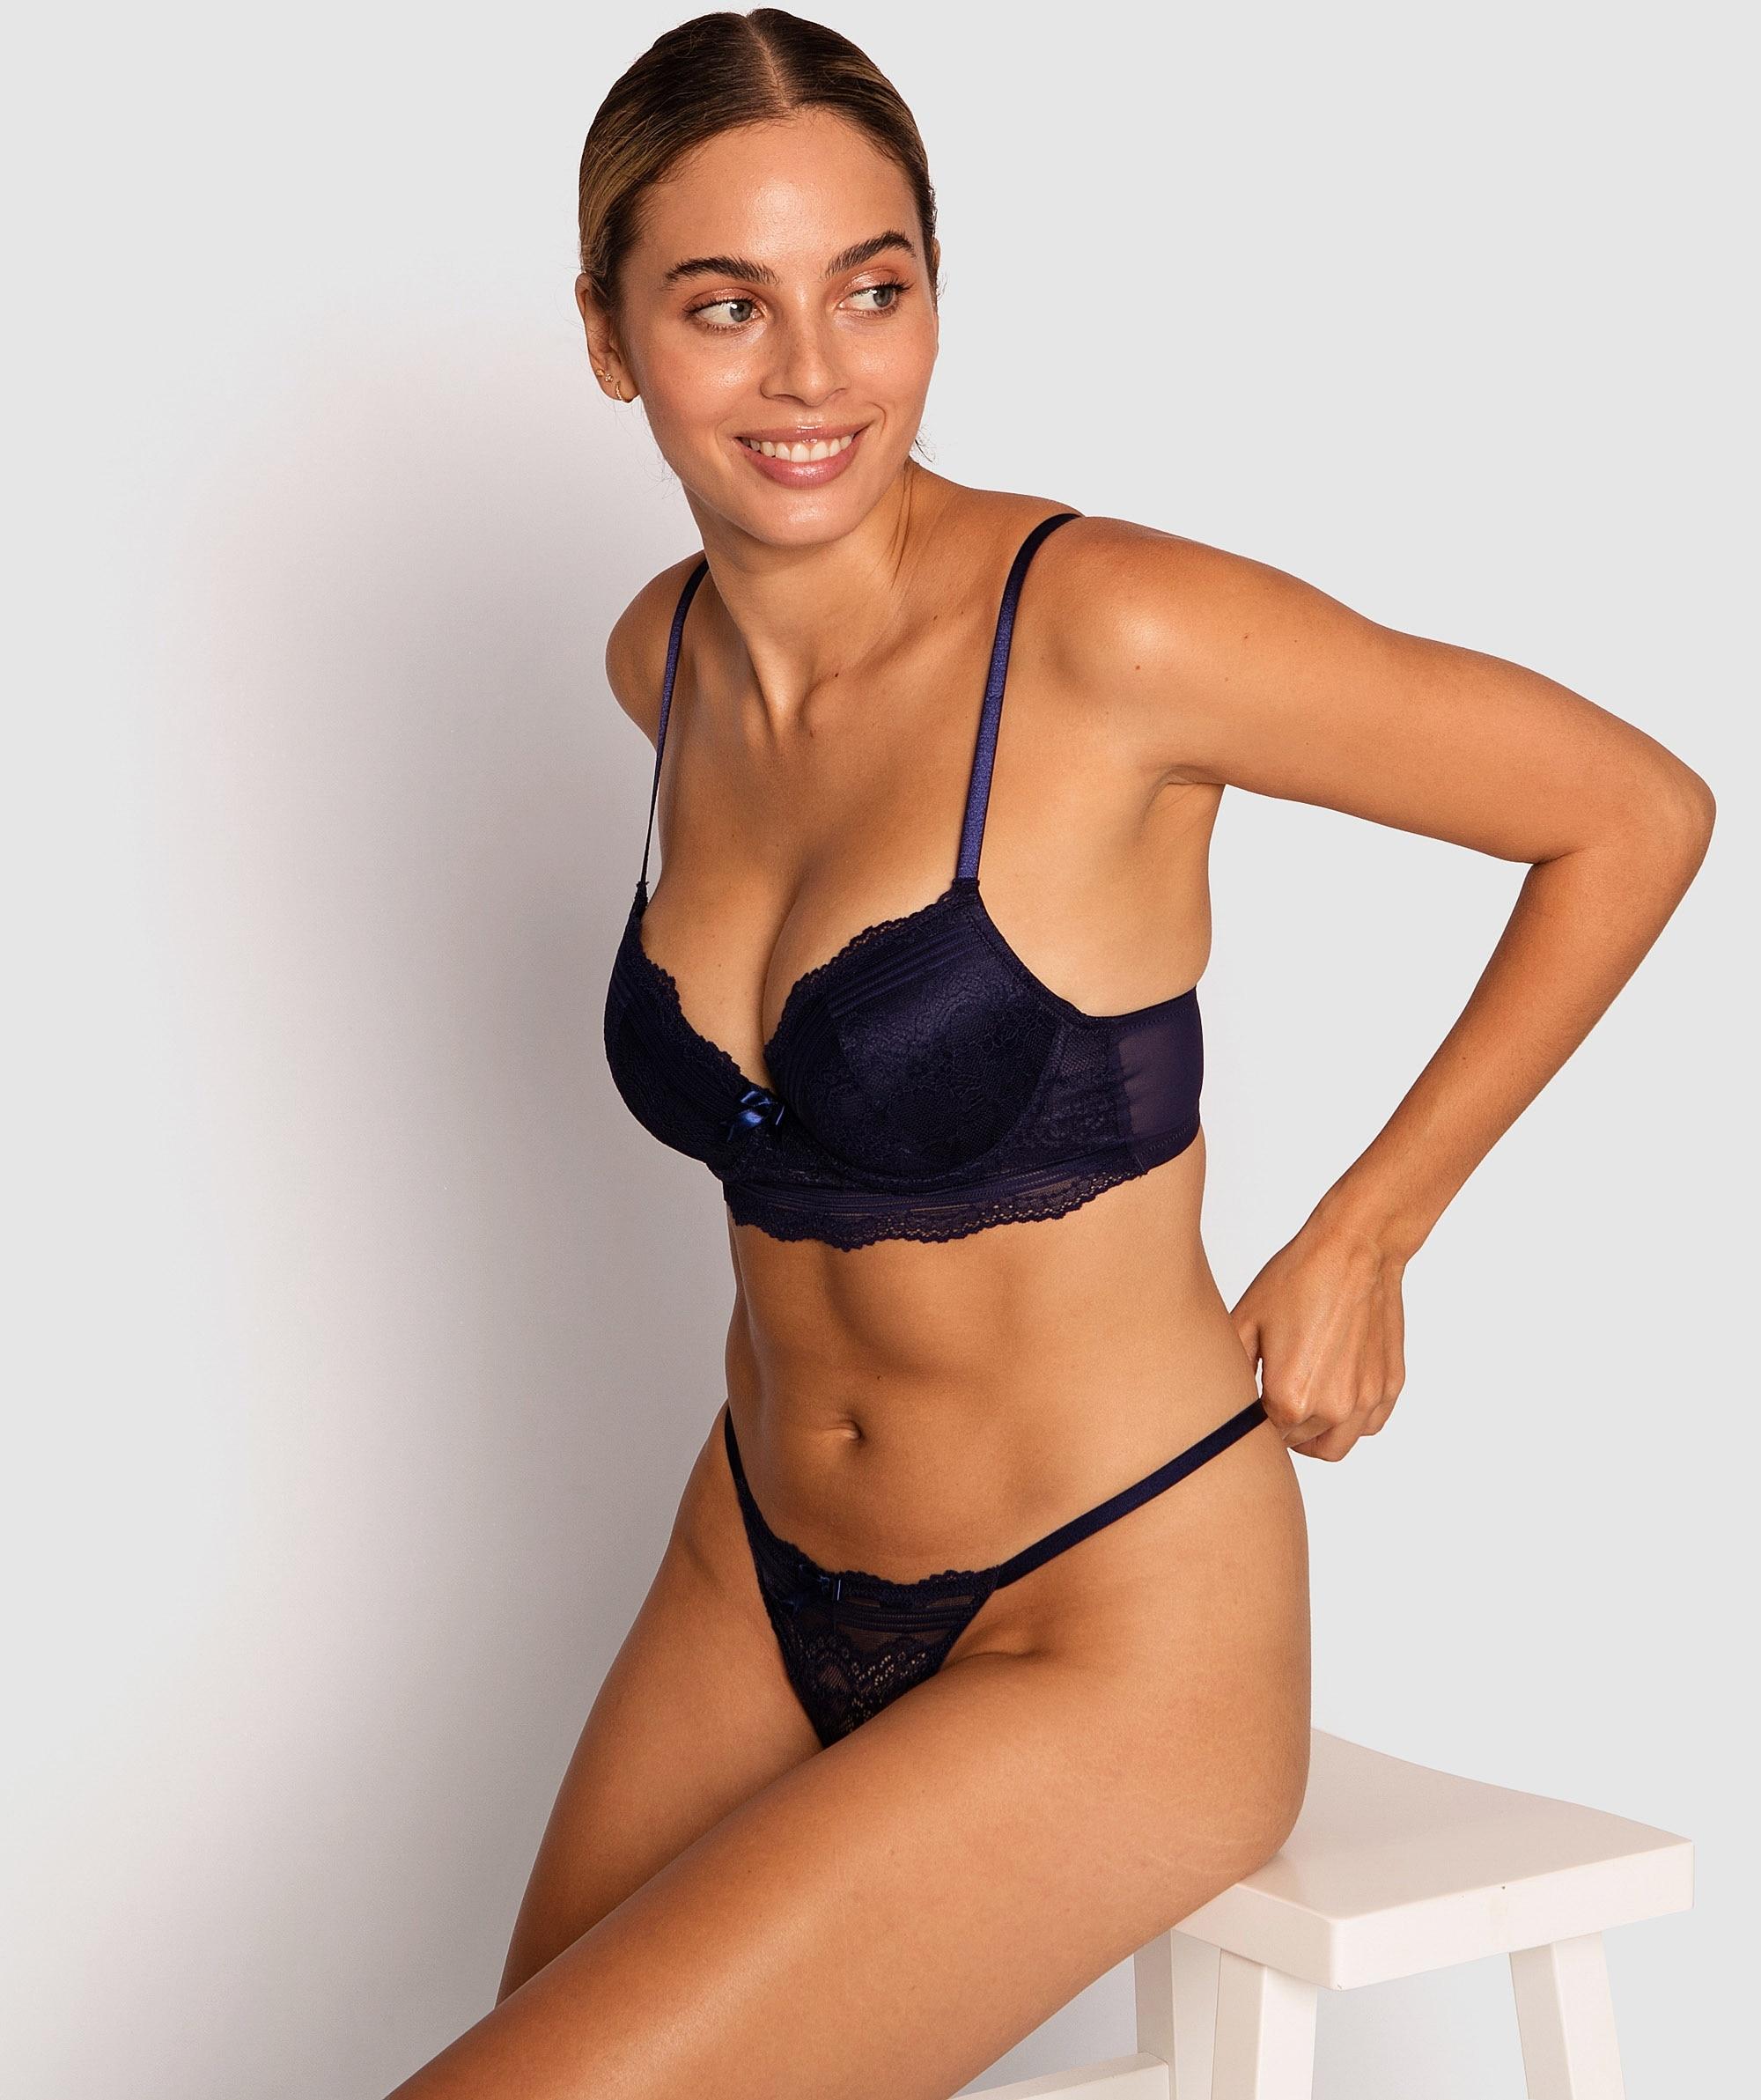 Olivia Push Up Bra - Navy